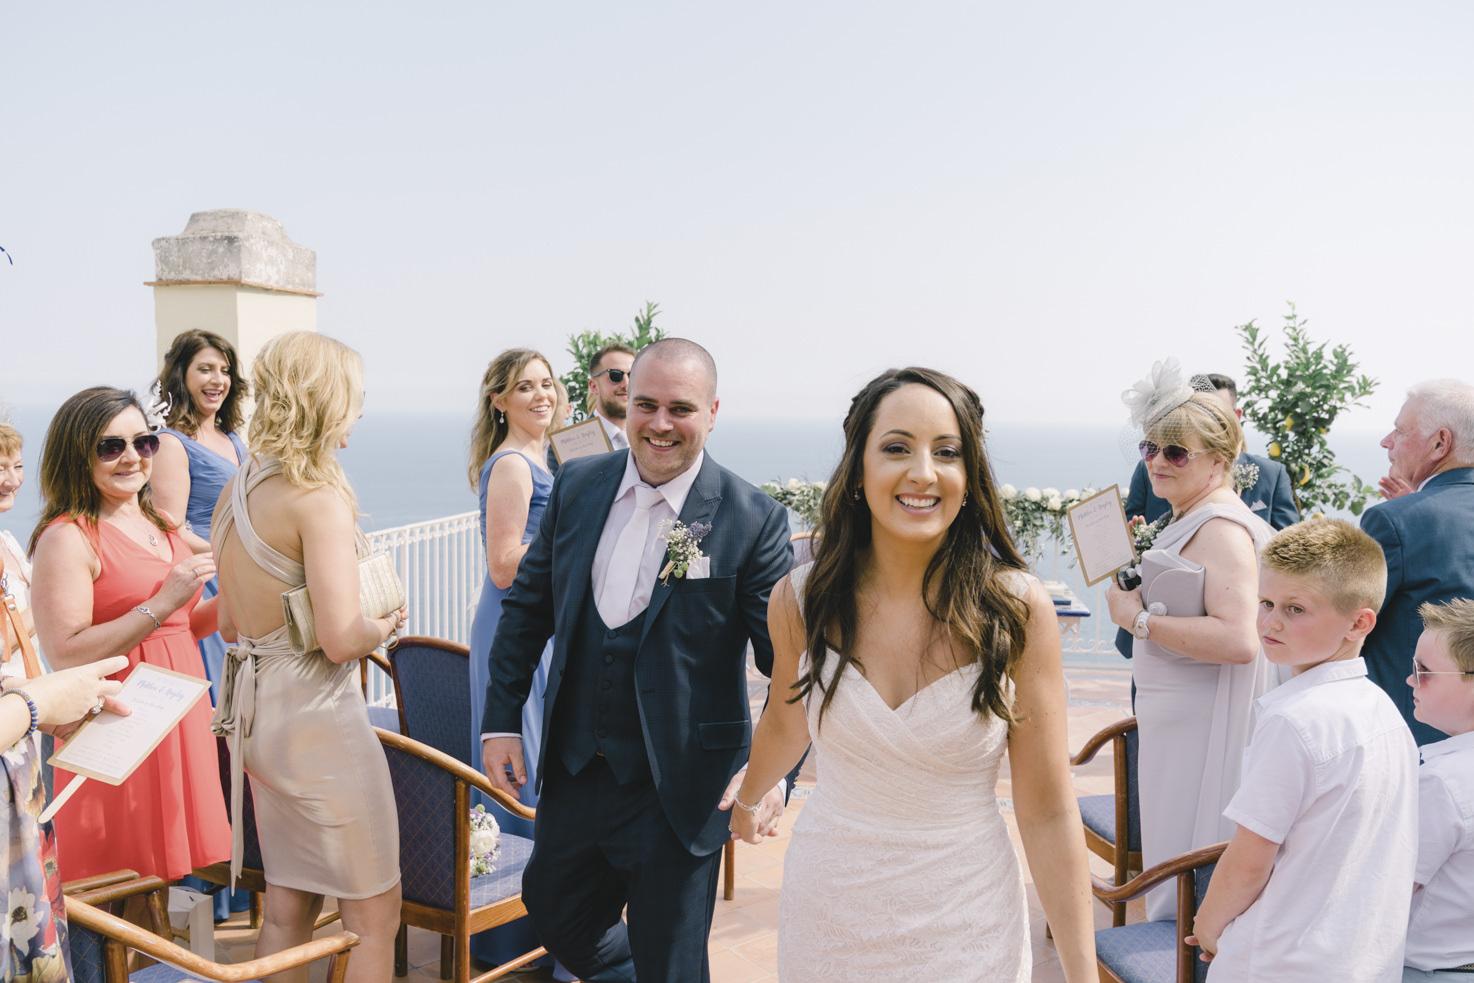 End of civil ceremony in Positano